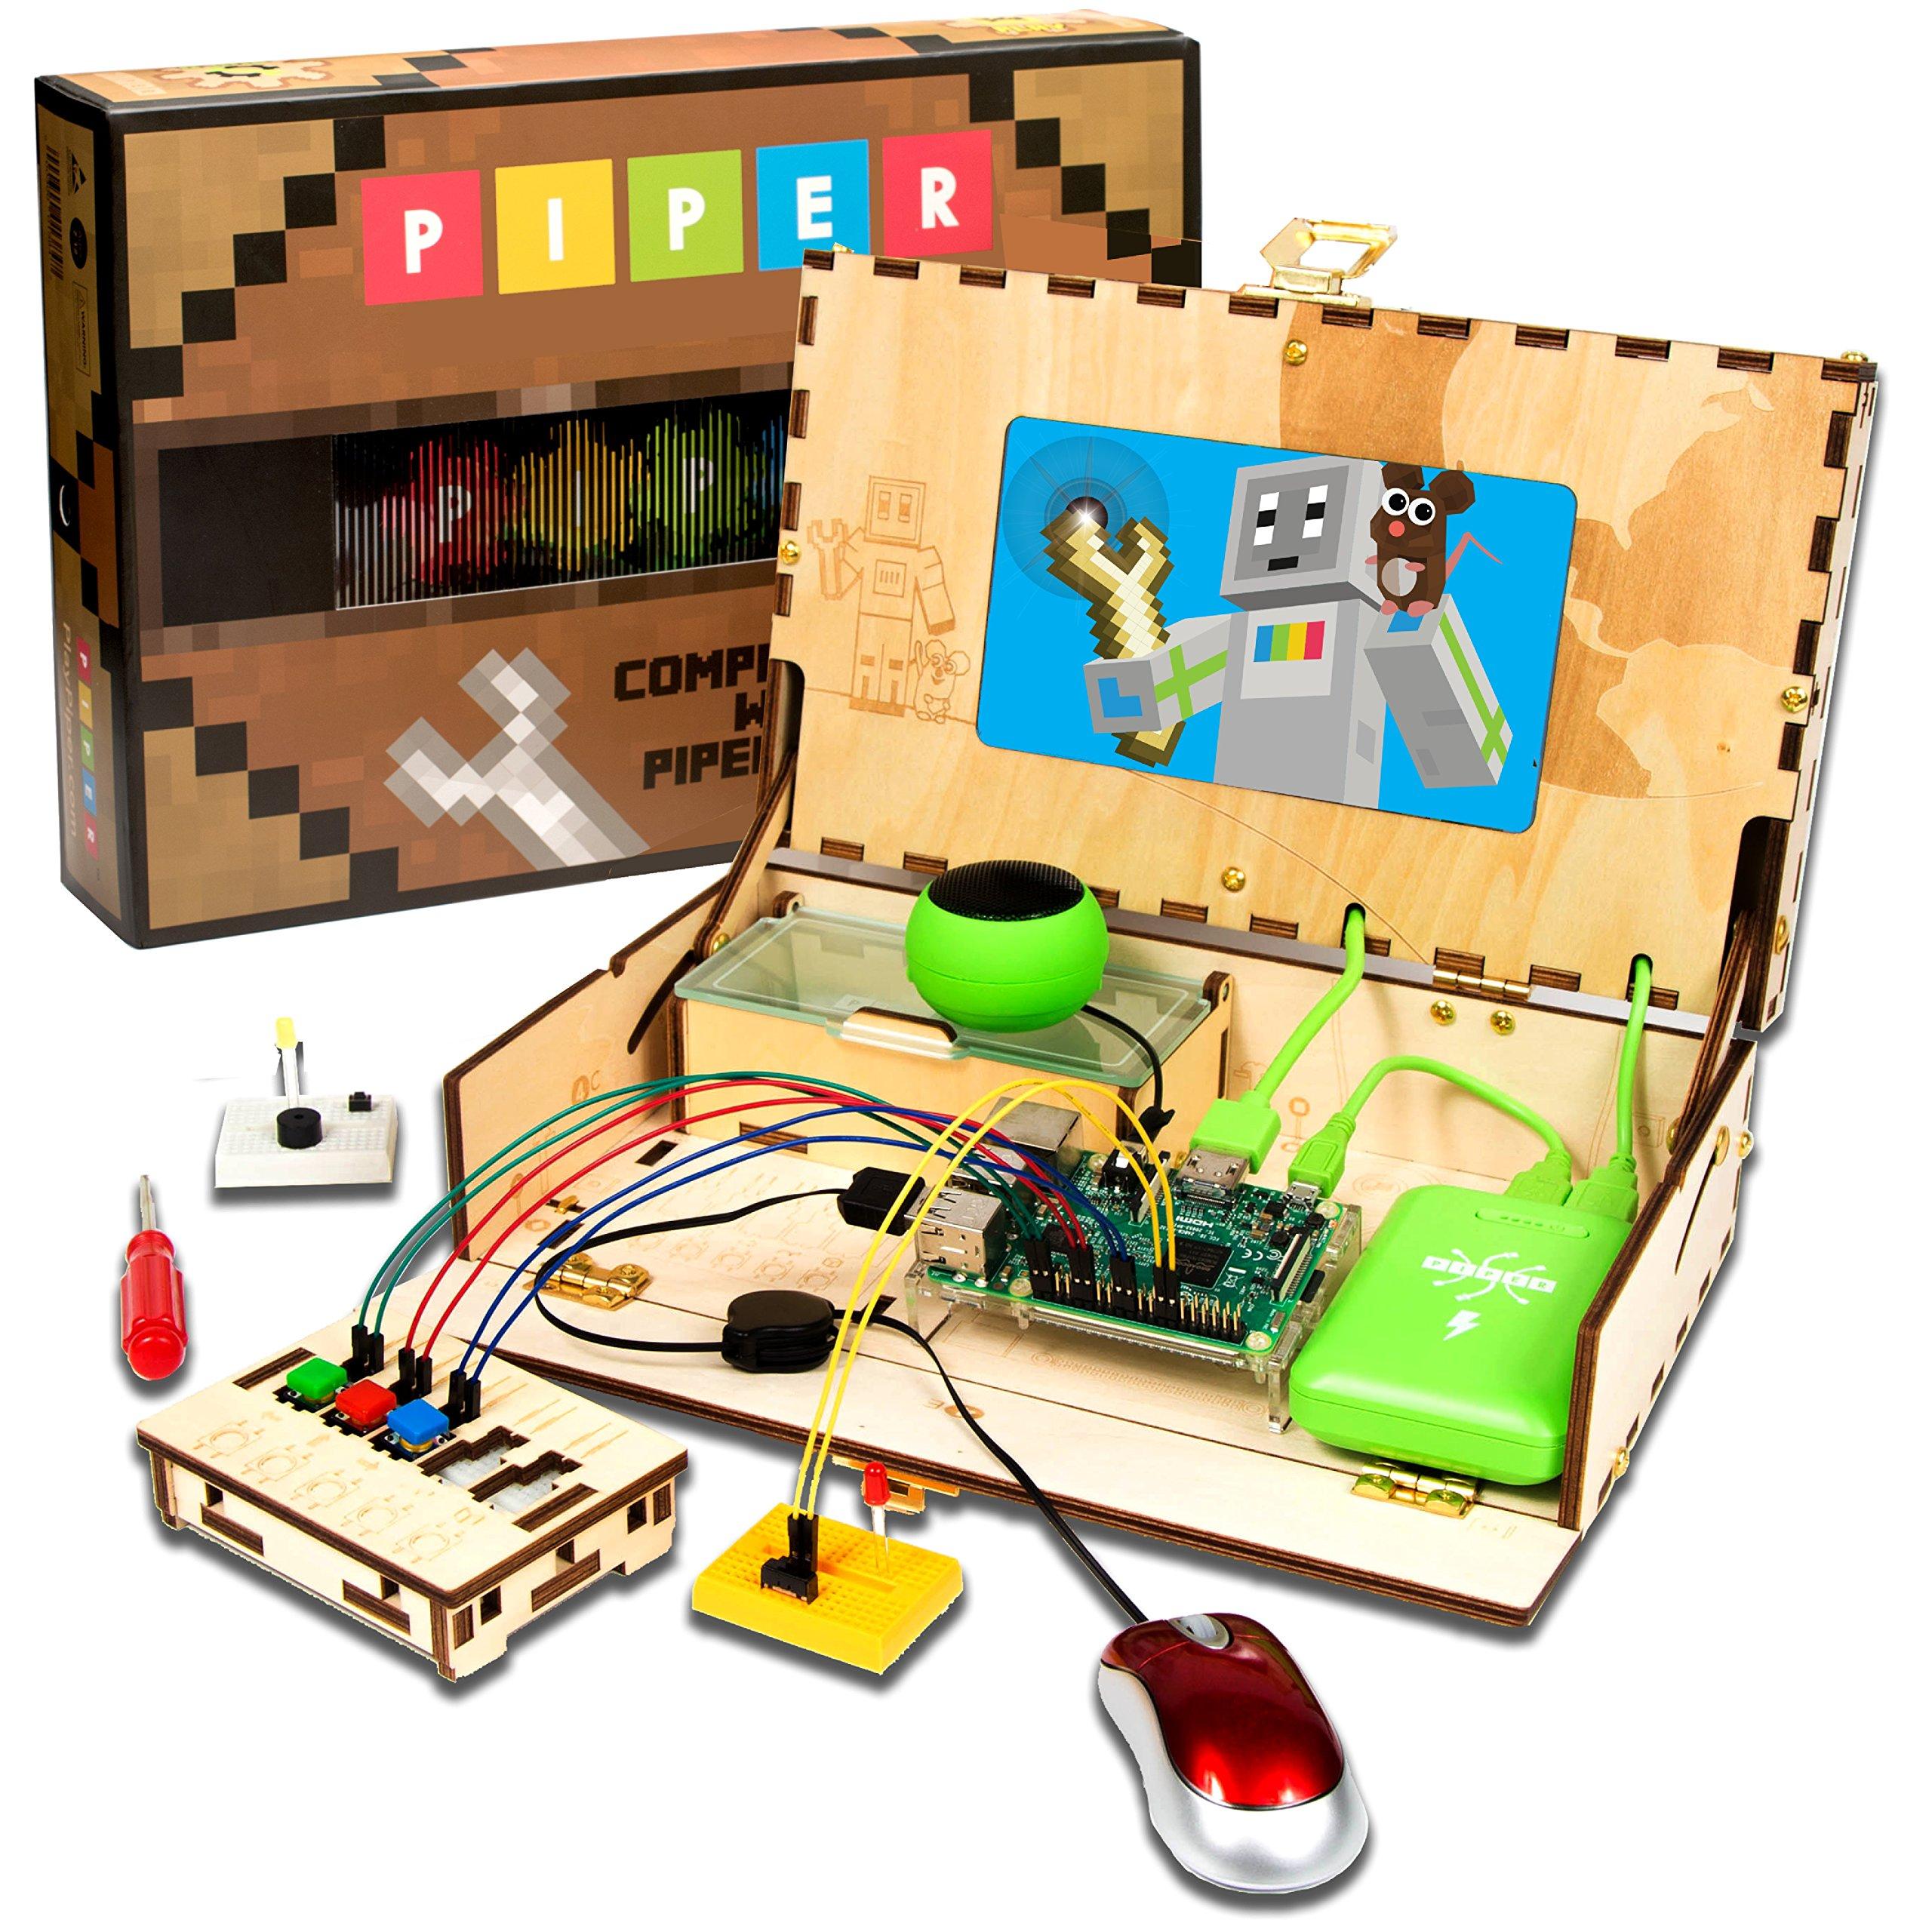 STEM Computer Kit